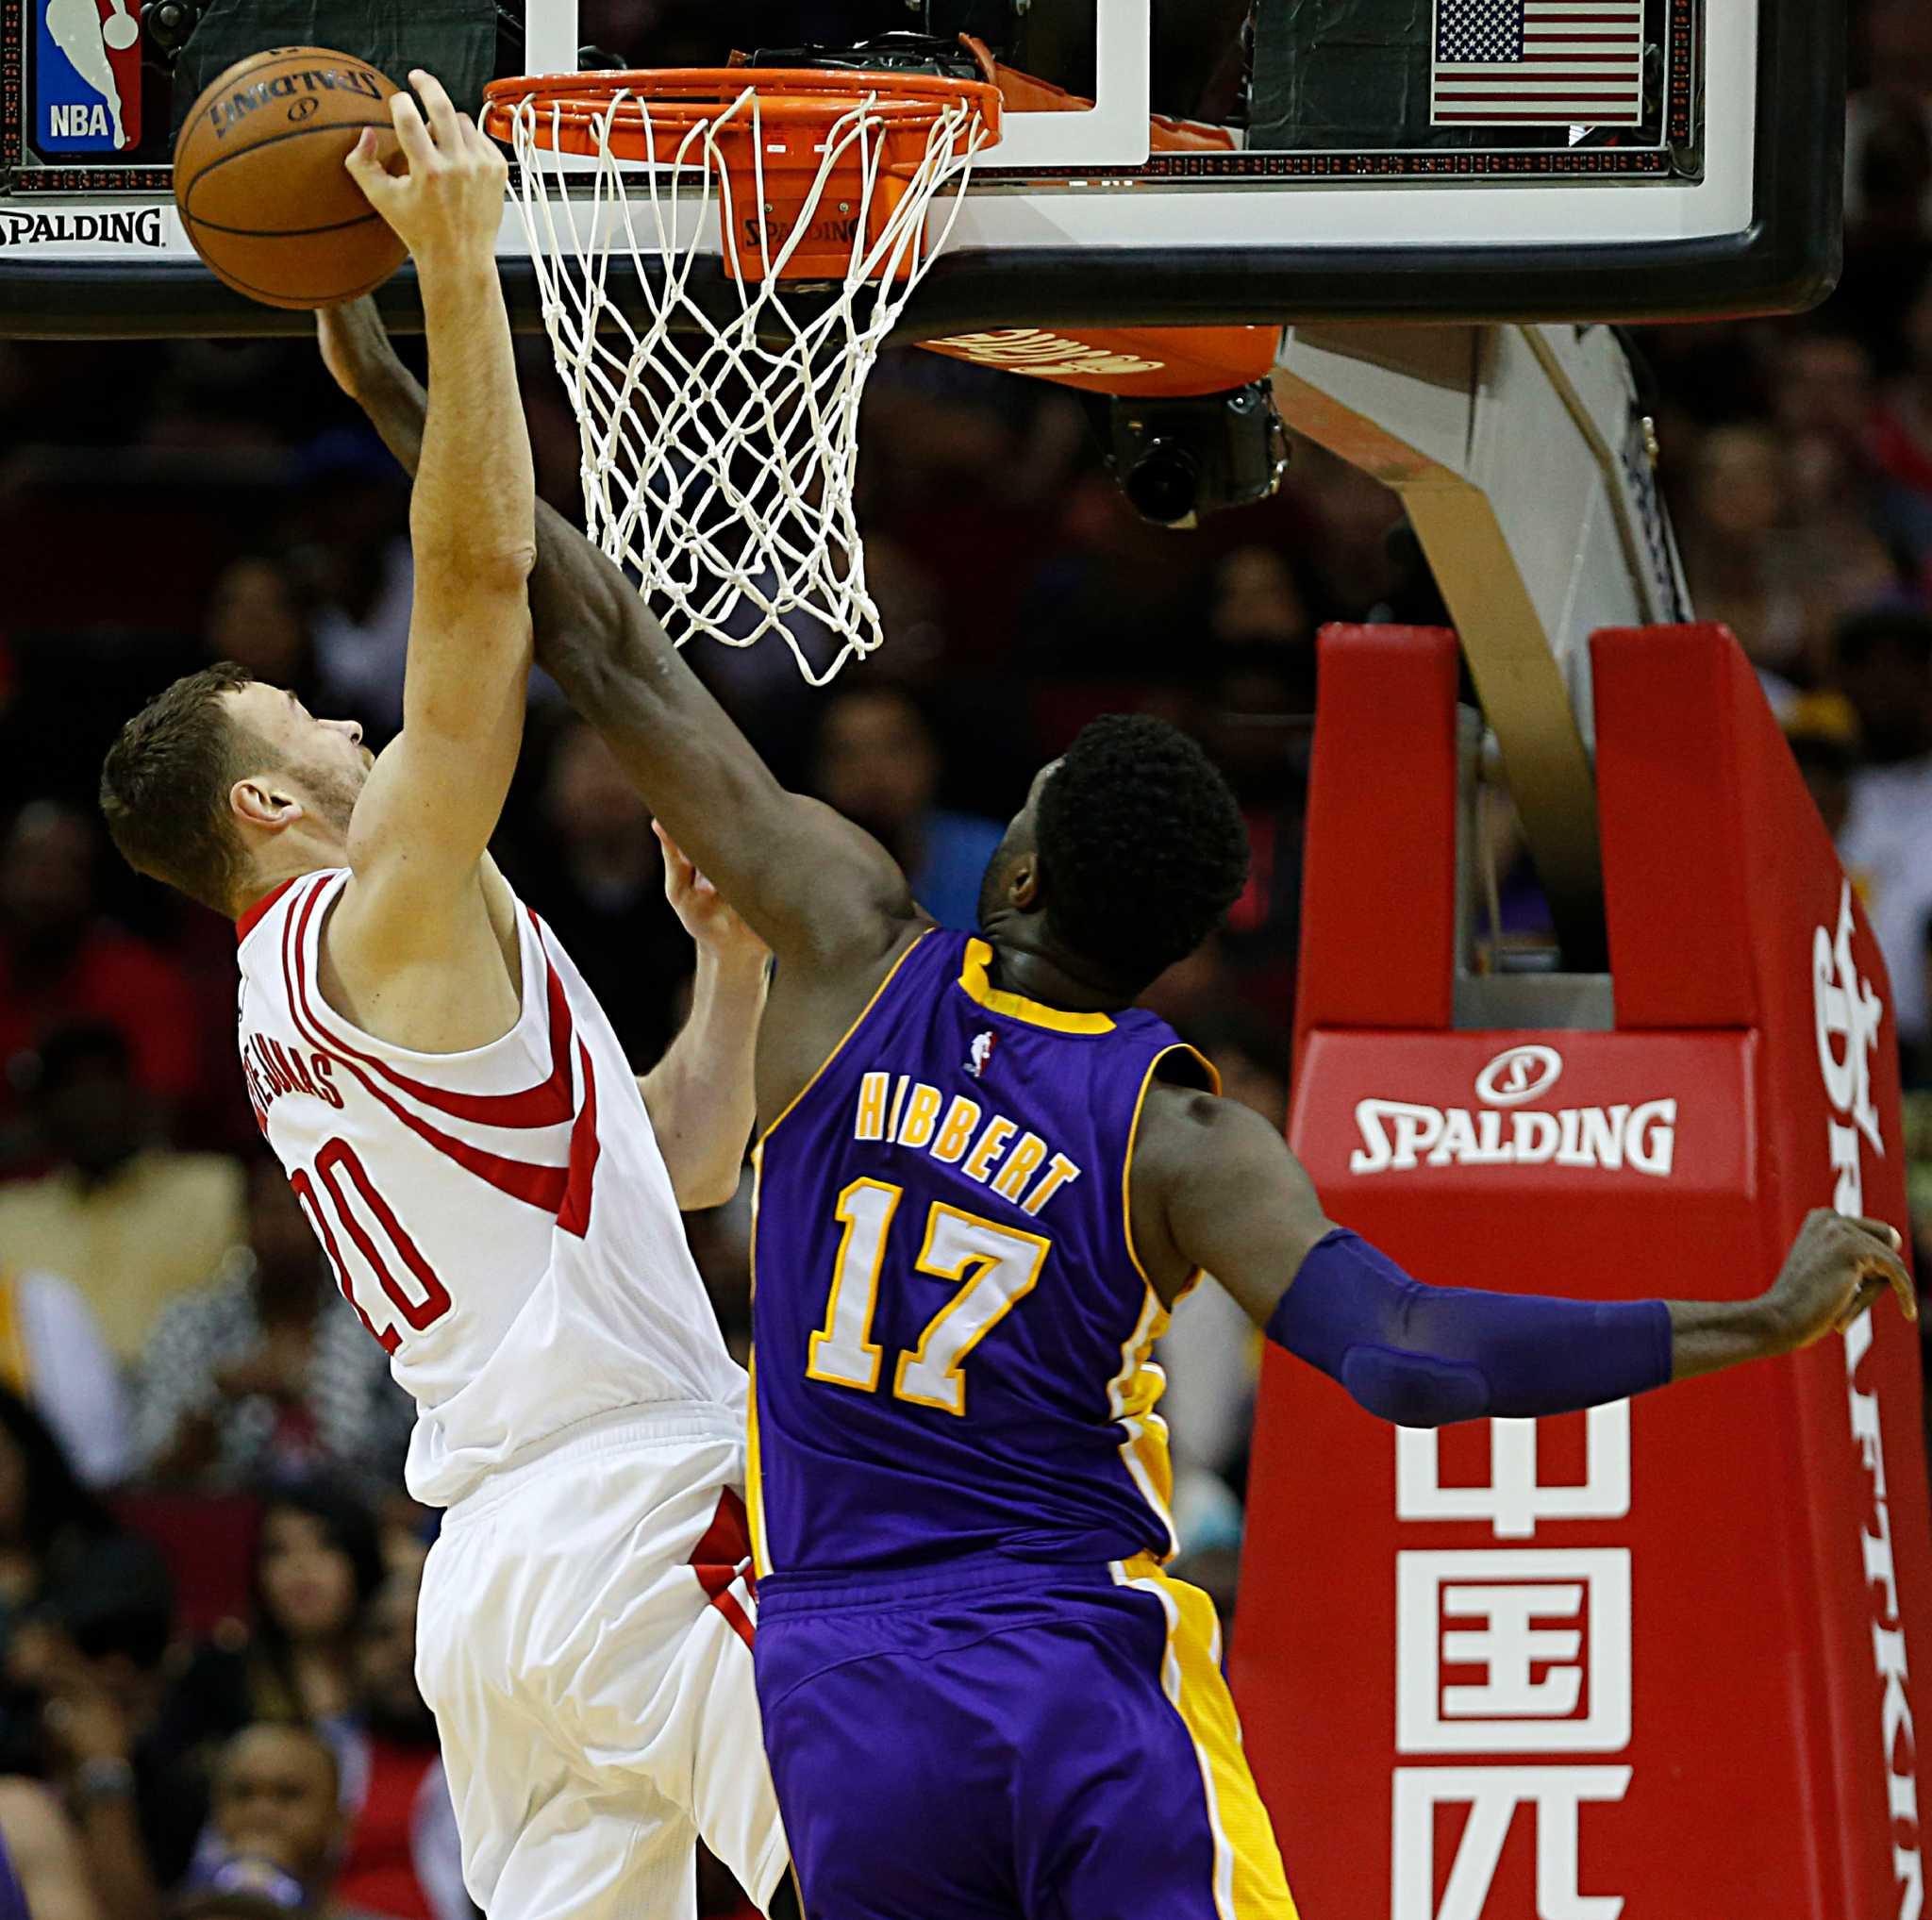 Houston Rockets X Lakers: James Harden Outduels Lakers' Kobe Bryant In Rockets' Win